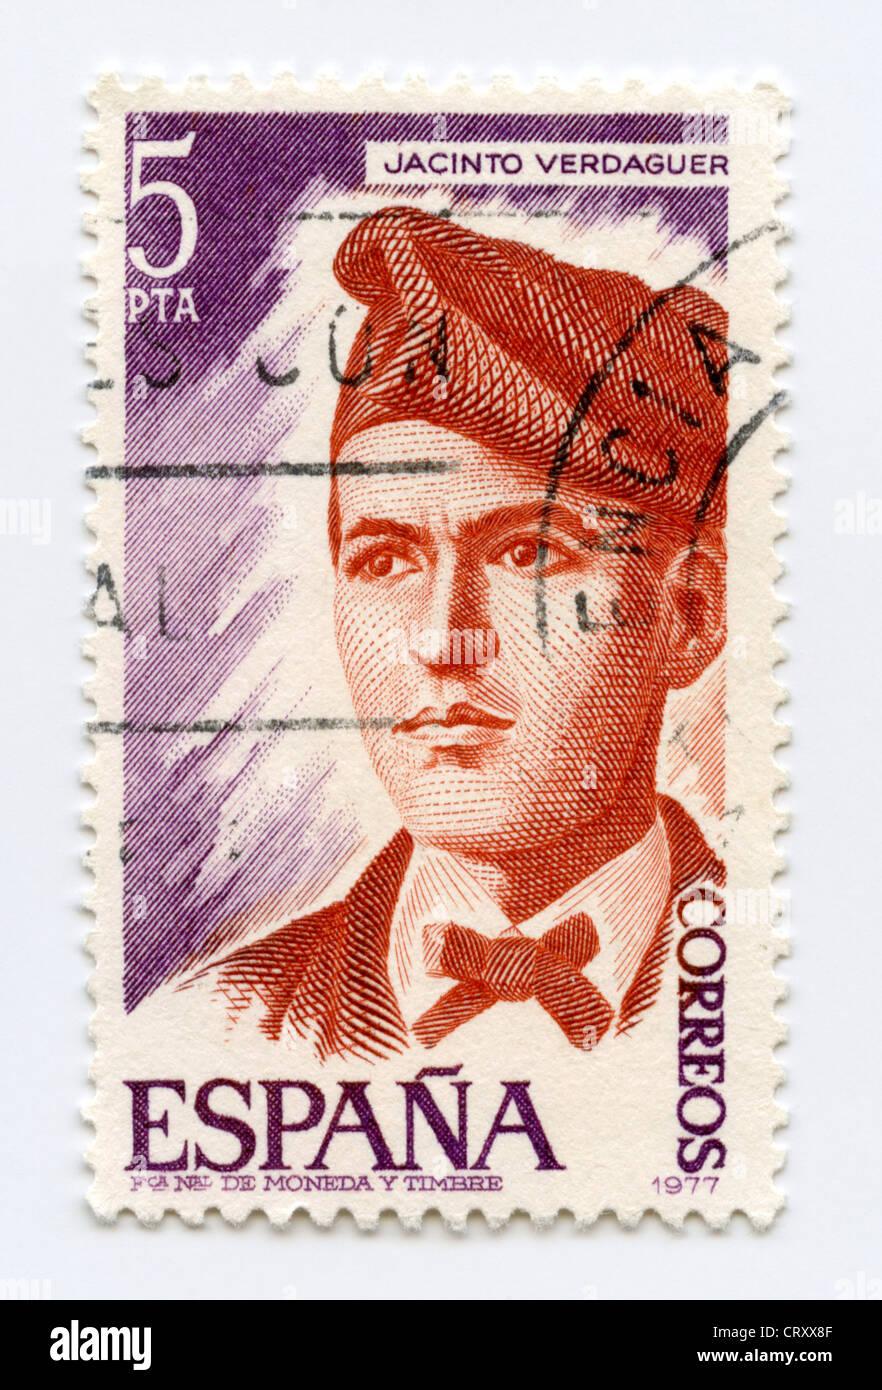 Spain postage stamp - Jacint Verdaguer, prominent Catalan poet - Stock Image